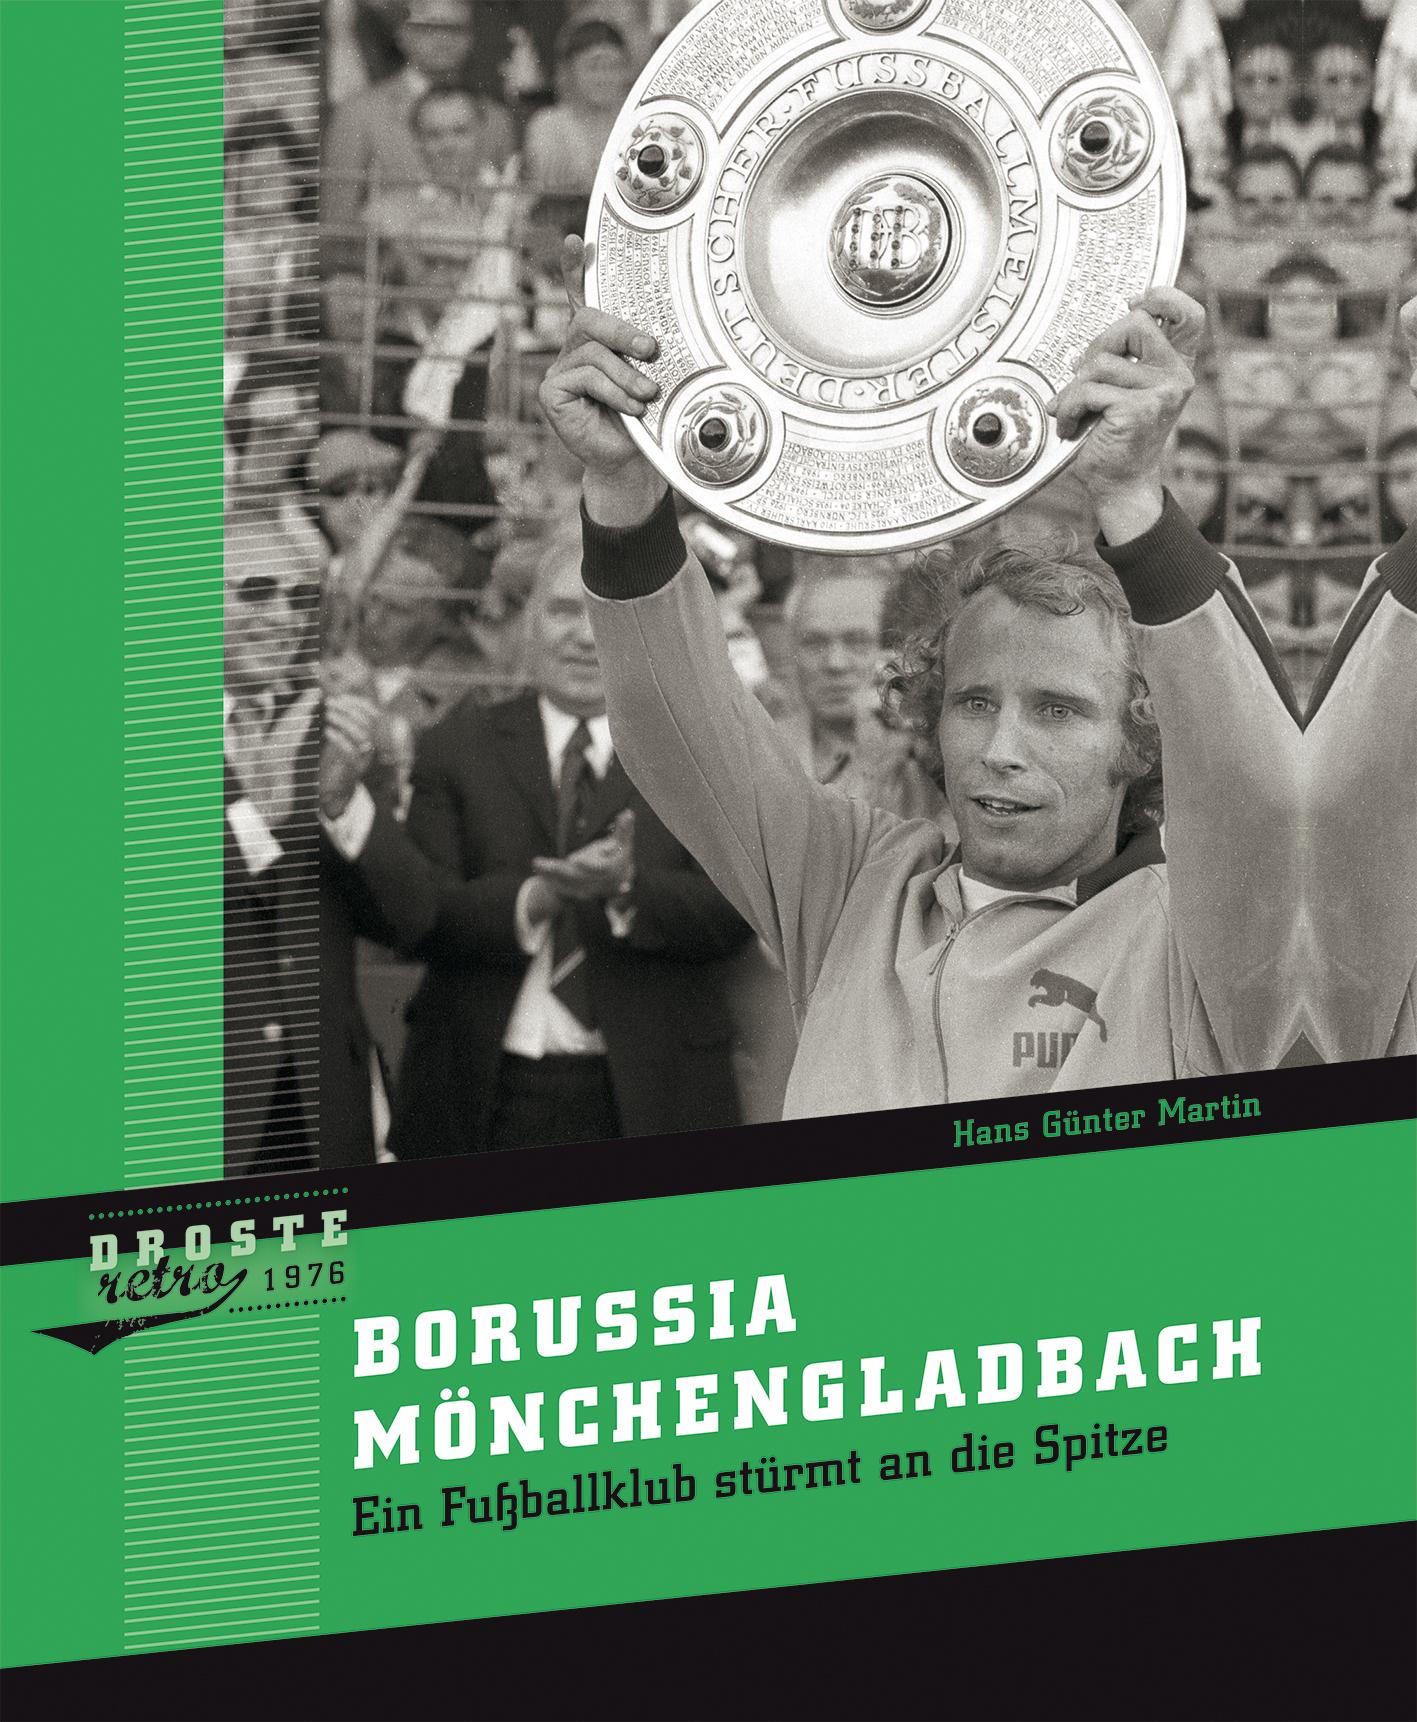 Borussia Mönchengladbach, Hans Günter Martin